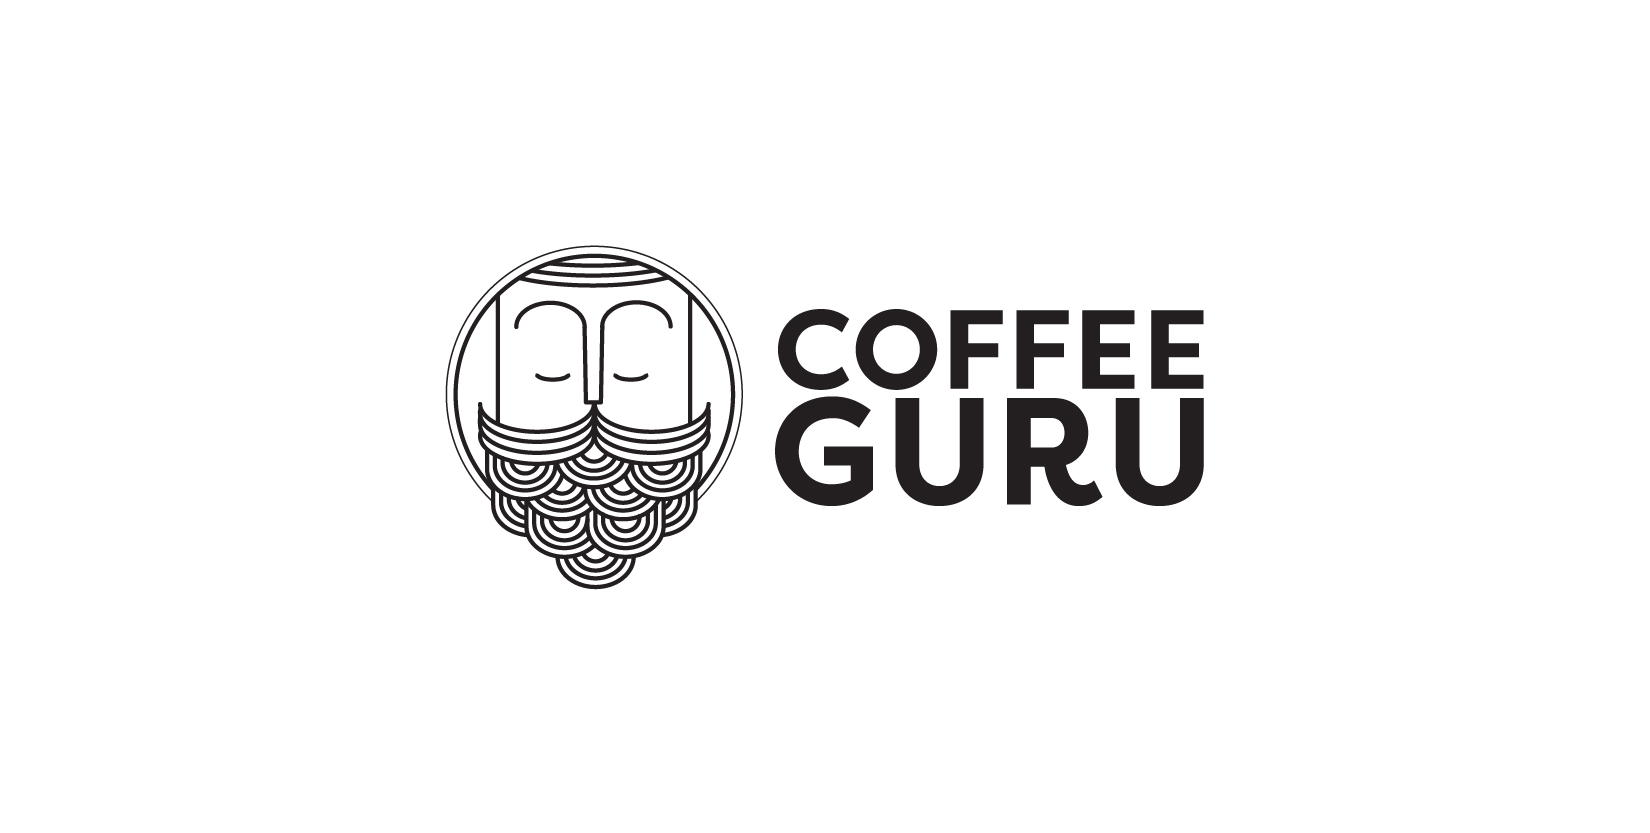 StephNE_LogoPortfolio_Coffee Guru 7.jpg